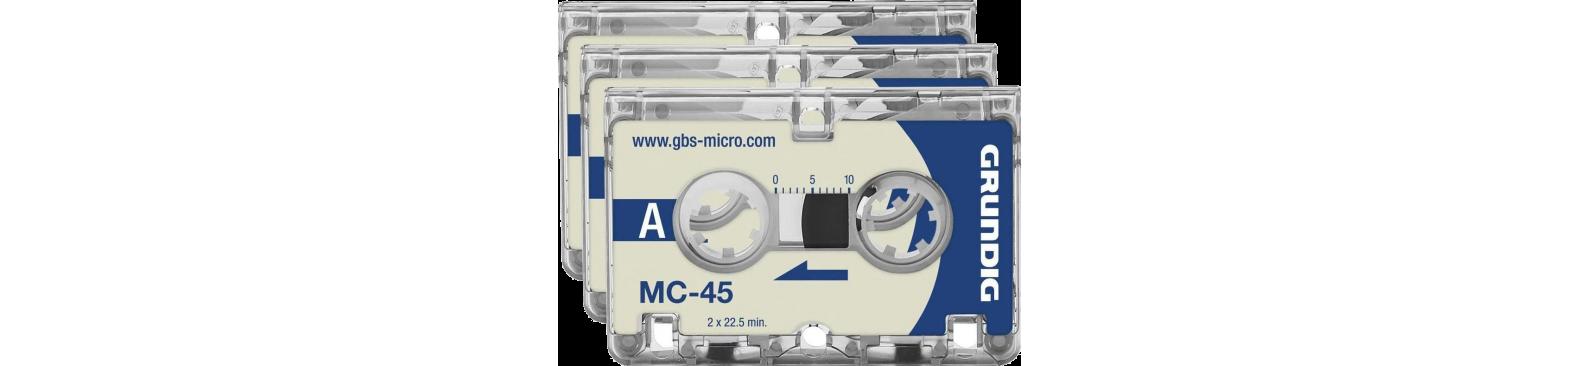 Dictaphone micro cassette – Enregistreur micro-cassette